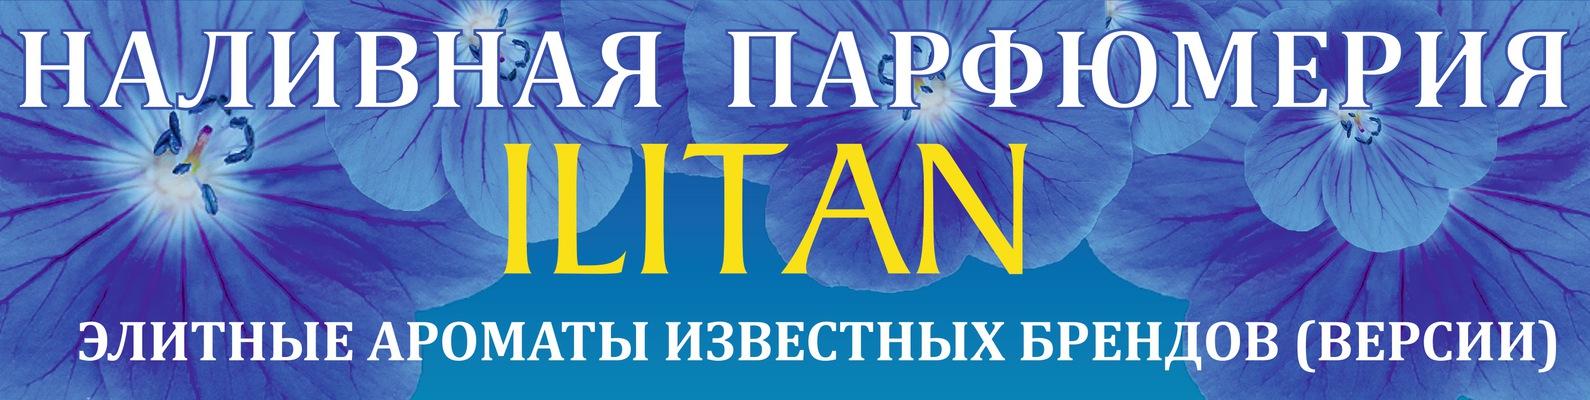 Наливная Парфюмерия ILITAN [селективы] ~ФРАНЦИЯ~ | ВКонтакте